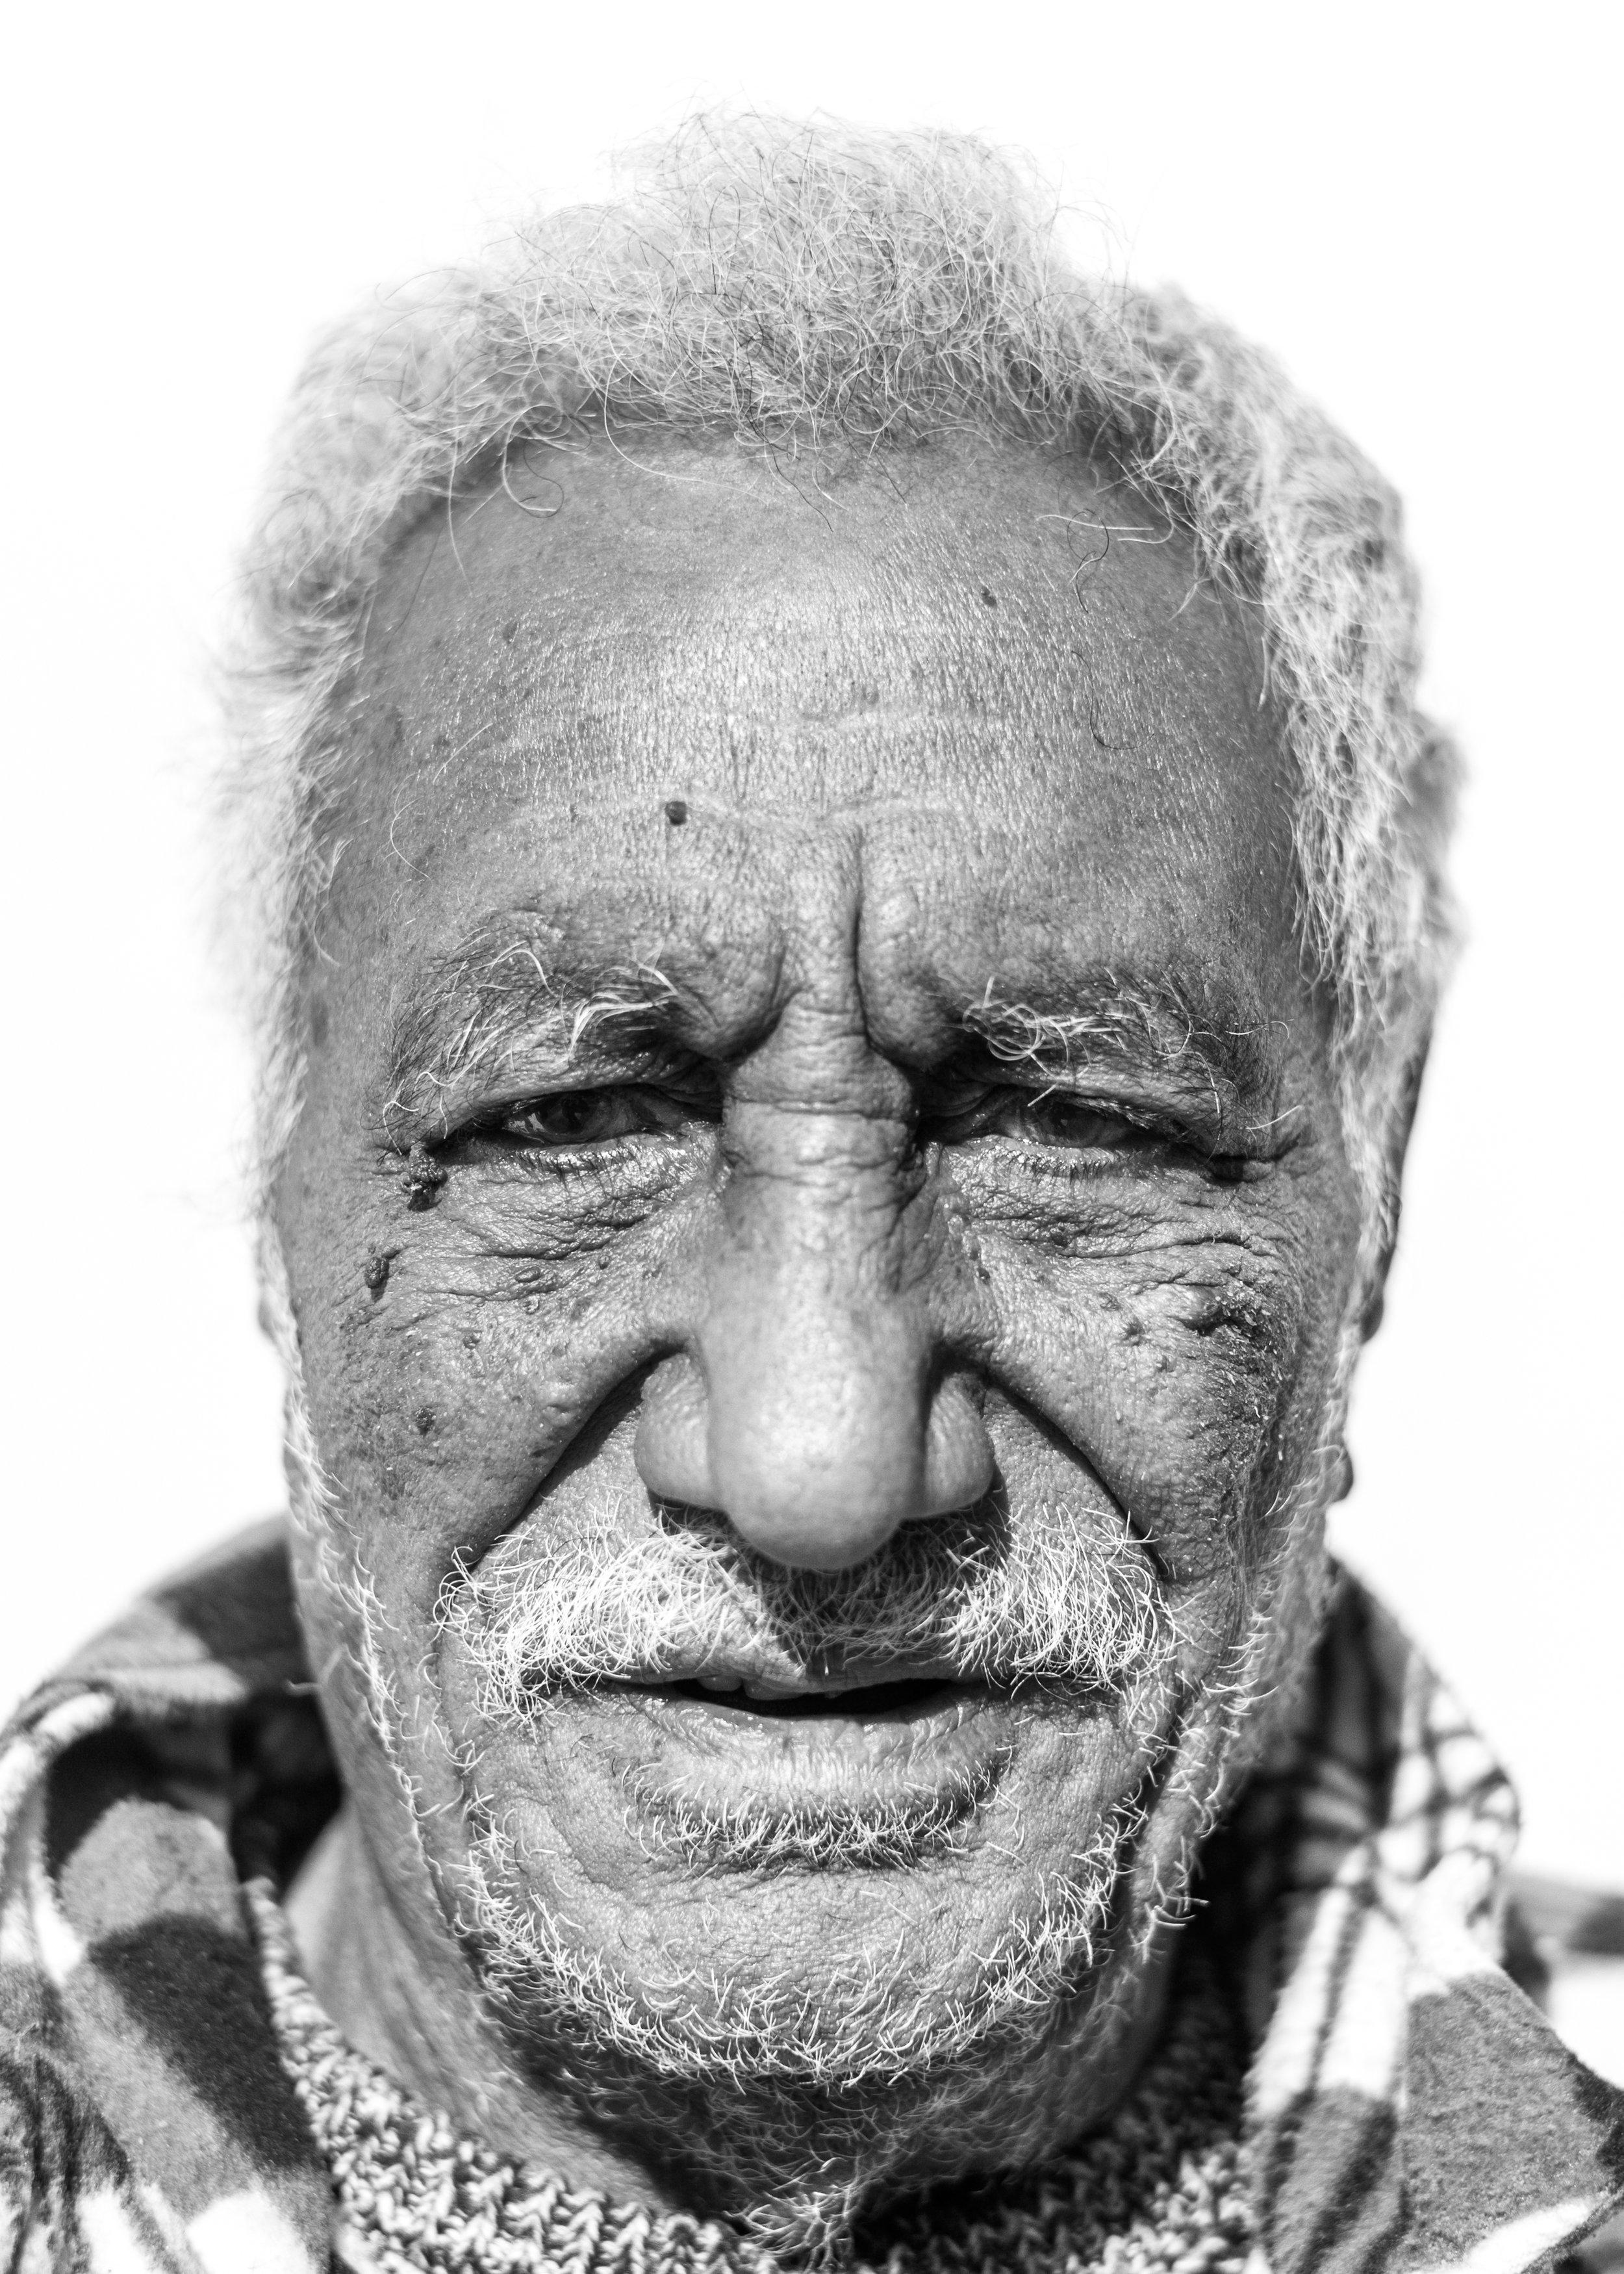 Man from Sudan, Brighton